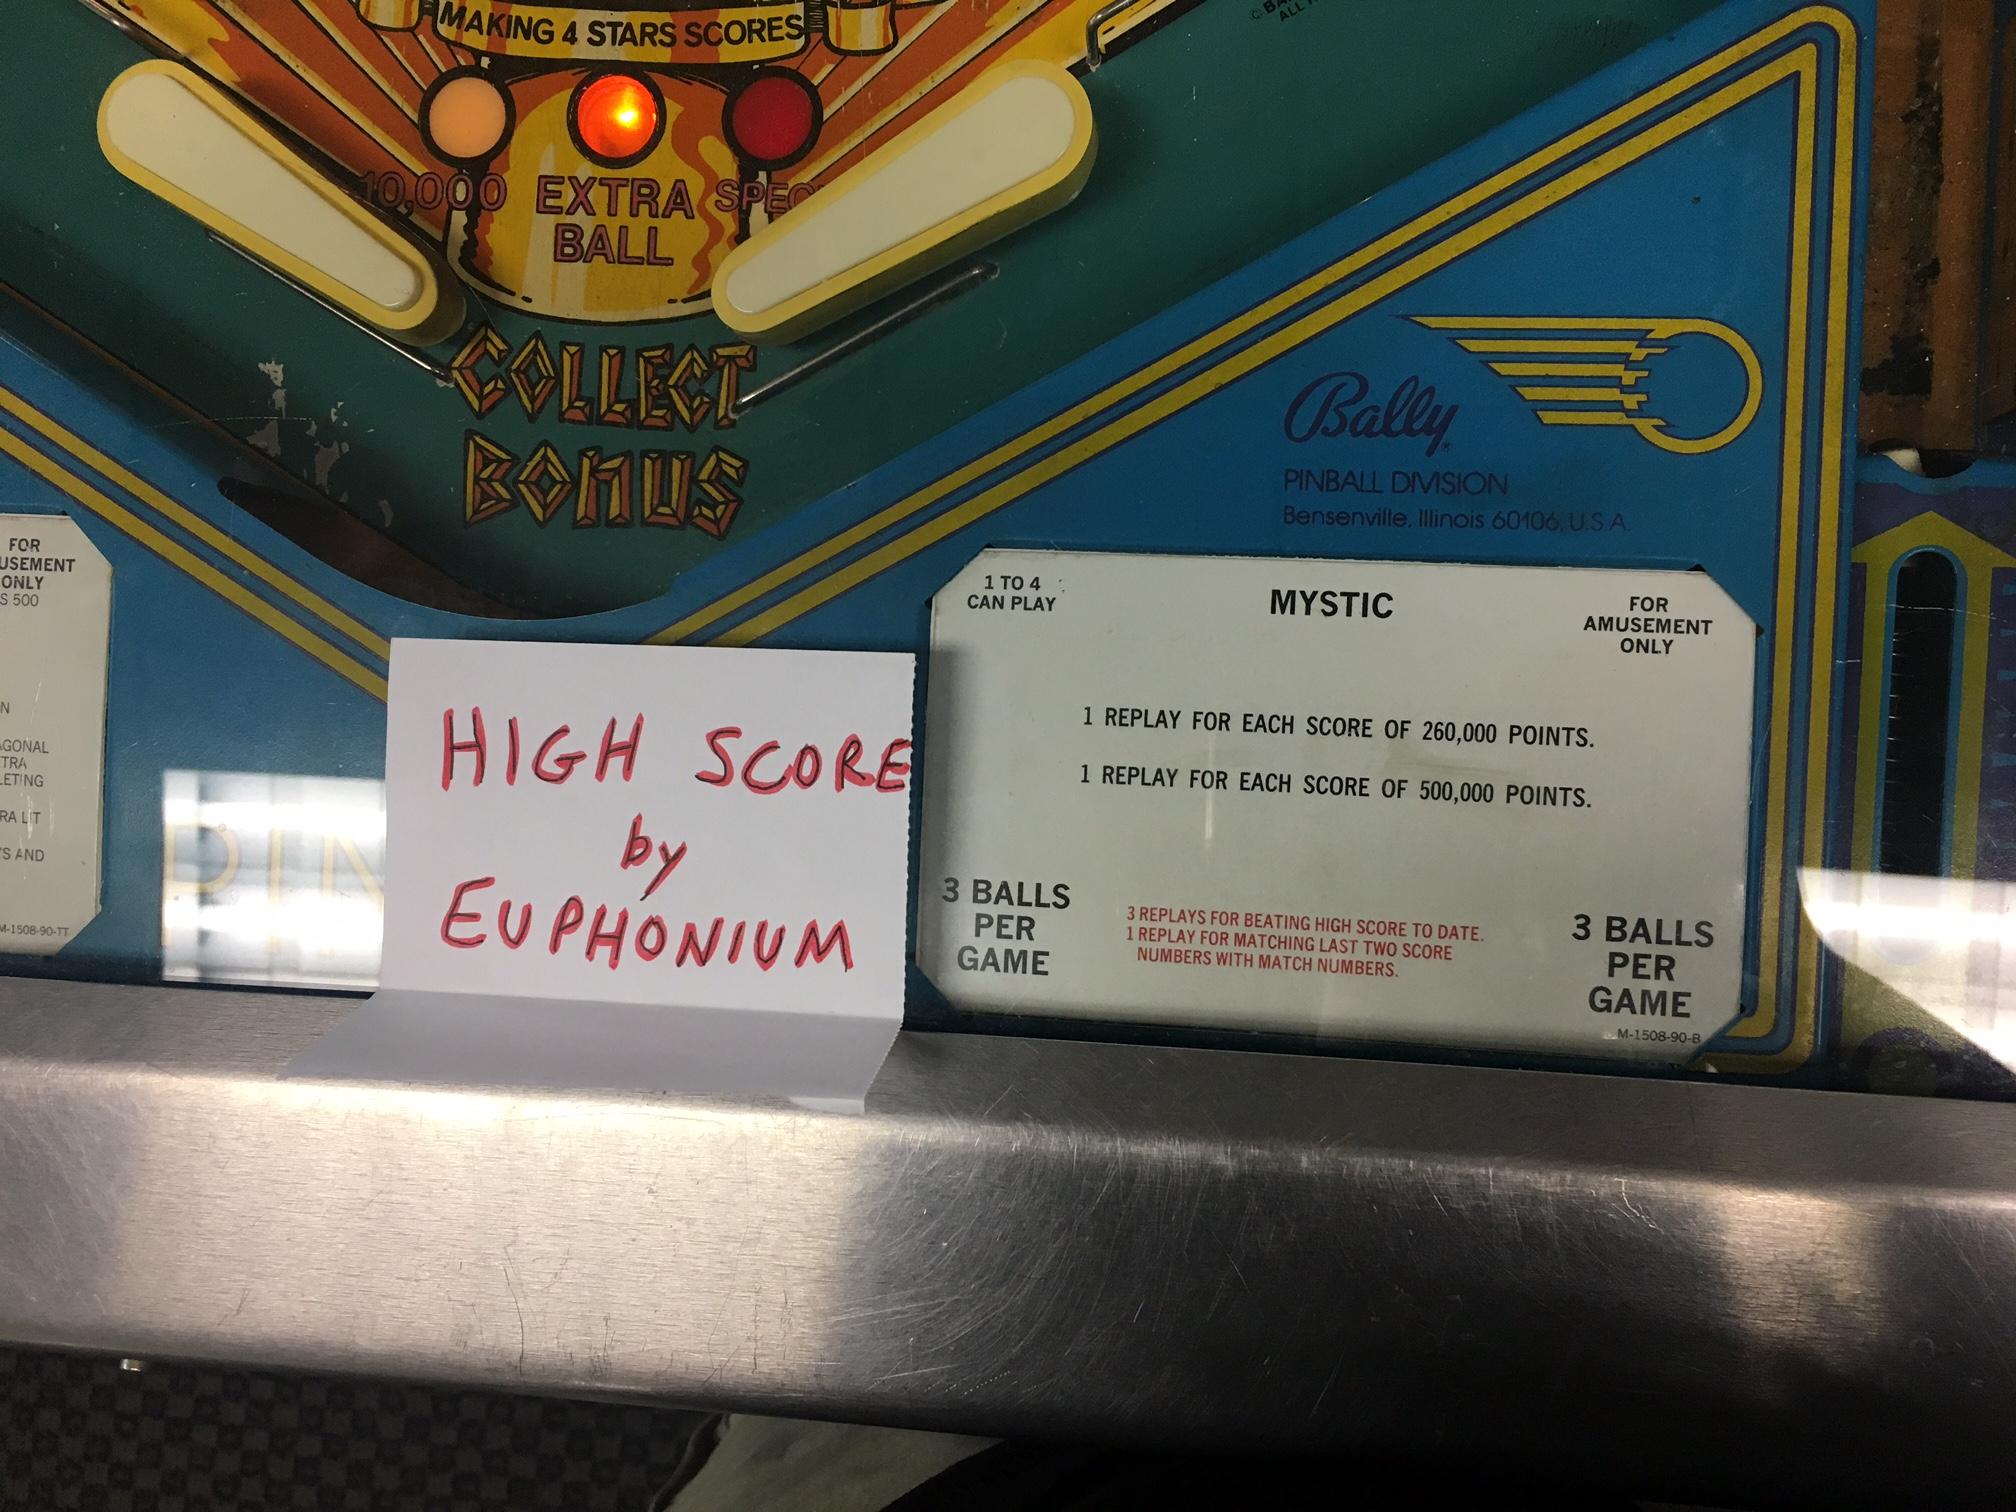 euphonium: Mystic [1980 Pinball] (Pinball: 3 Balls) 117,270 points on 2018-10-03 17:41:25